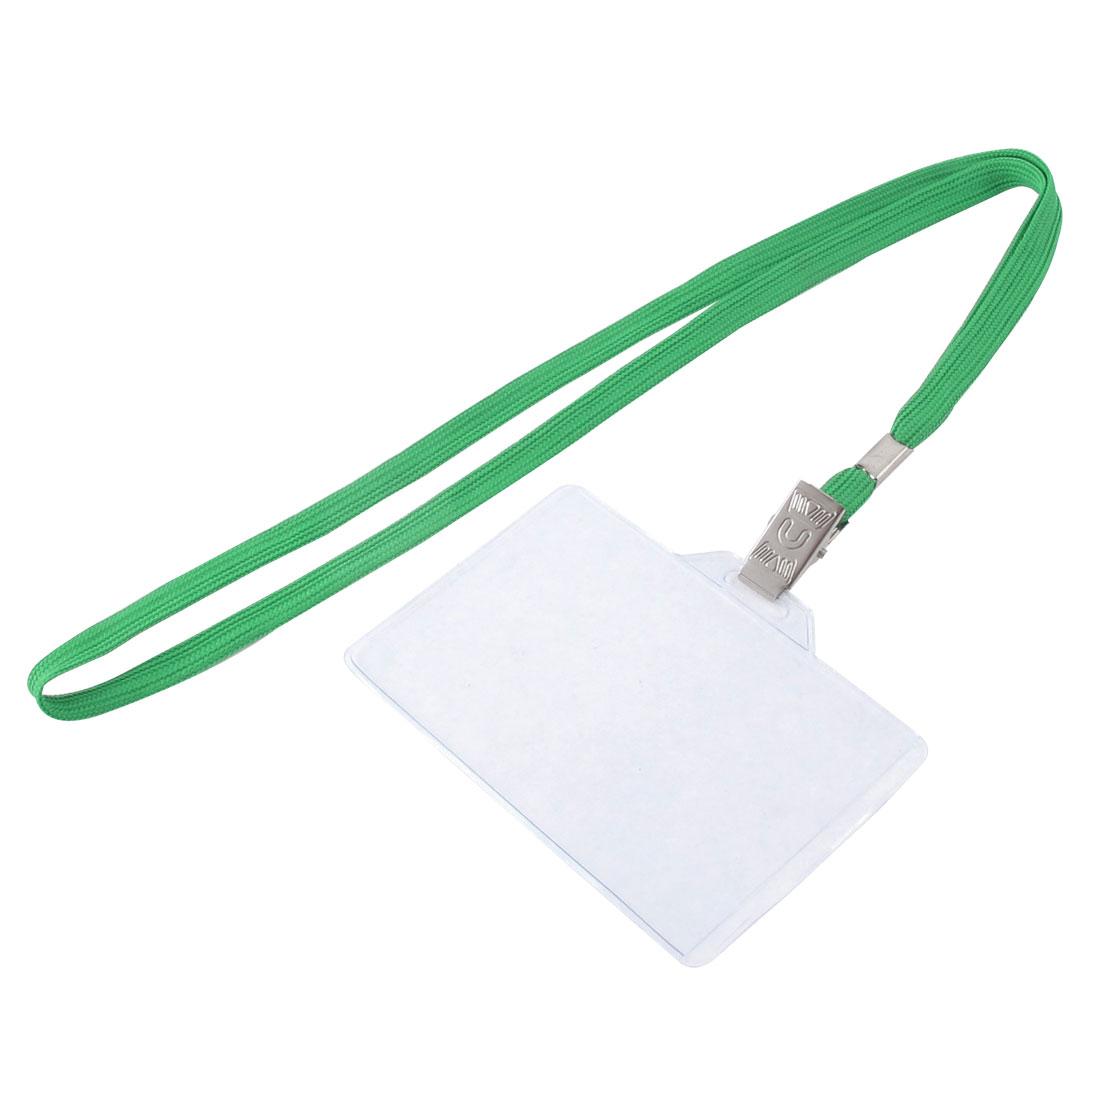 Lanyard Plastic Horizontal ID Name Employee Badge Card Holder Green Clear